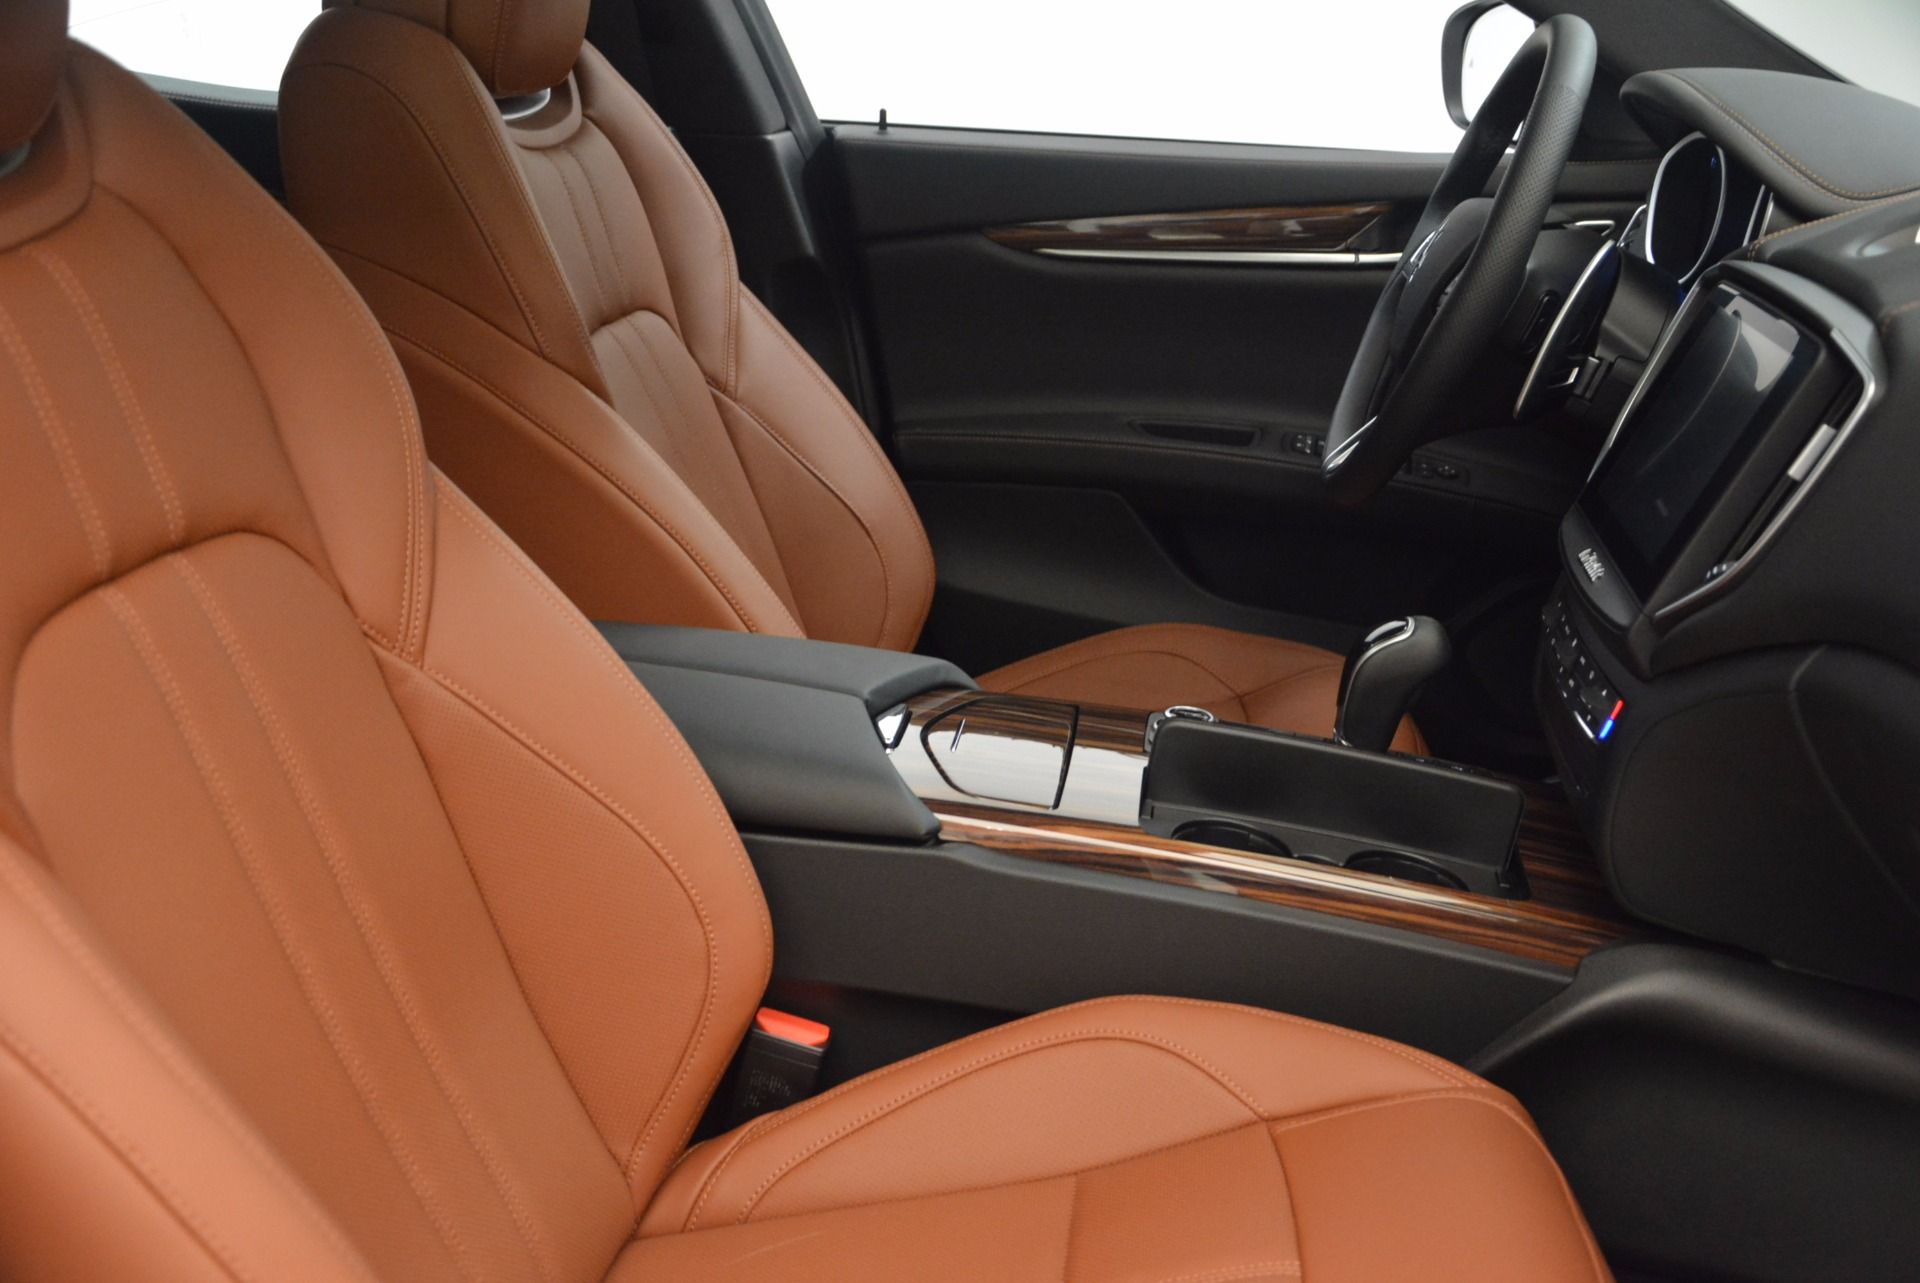 New 2018 Maserati Ghibli S Q4 Gransport For Sale In Greenwich, CT 1562_p20